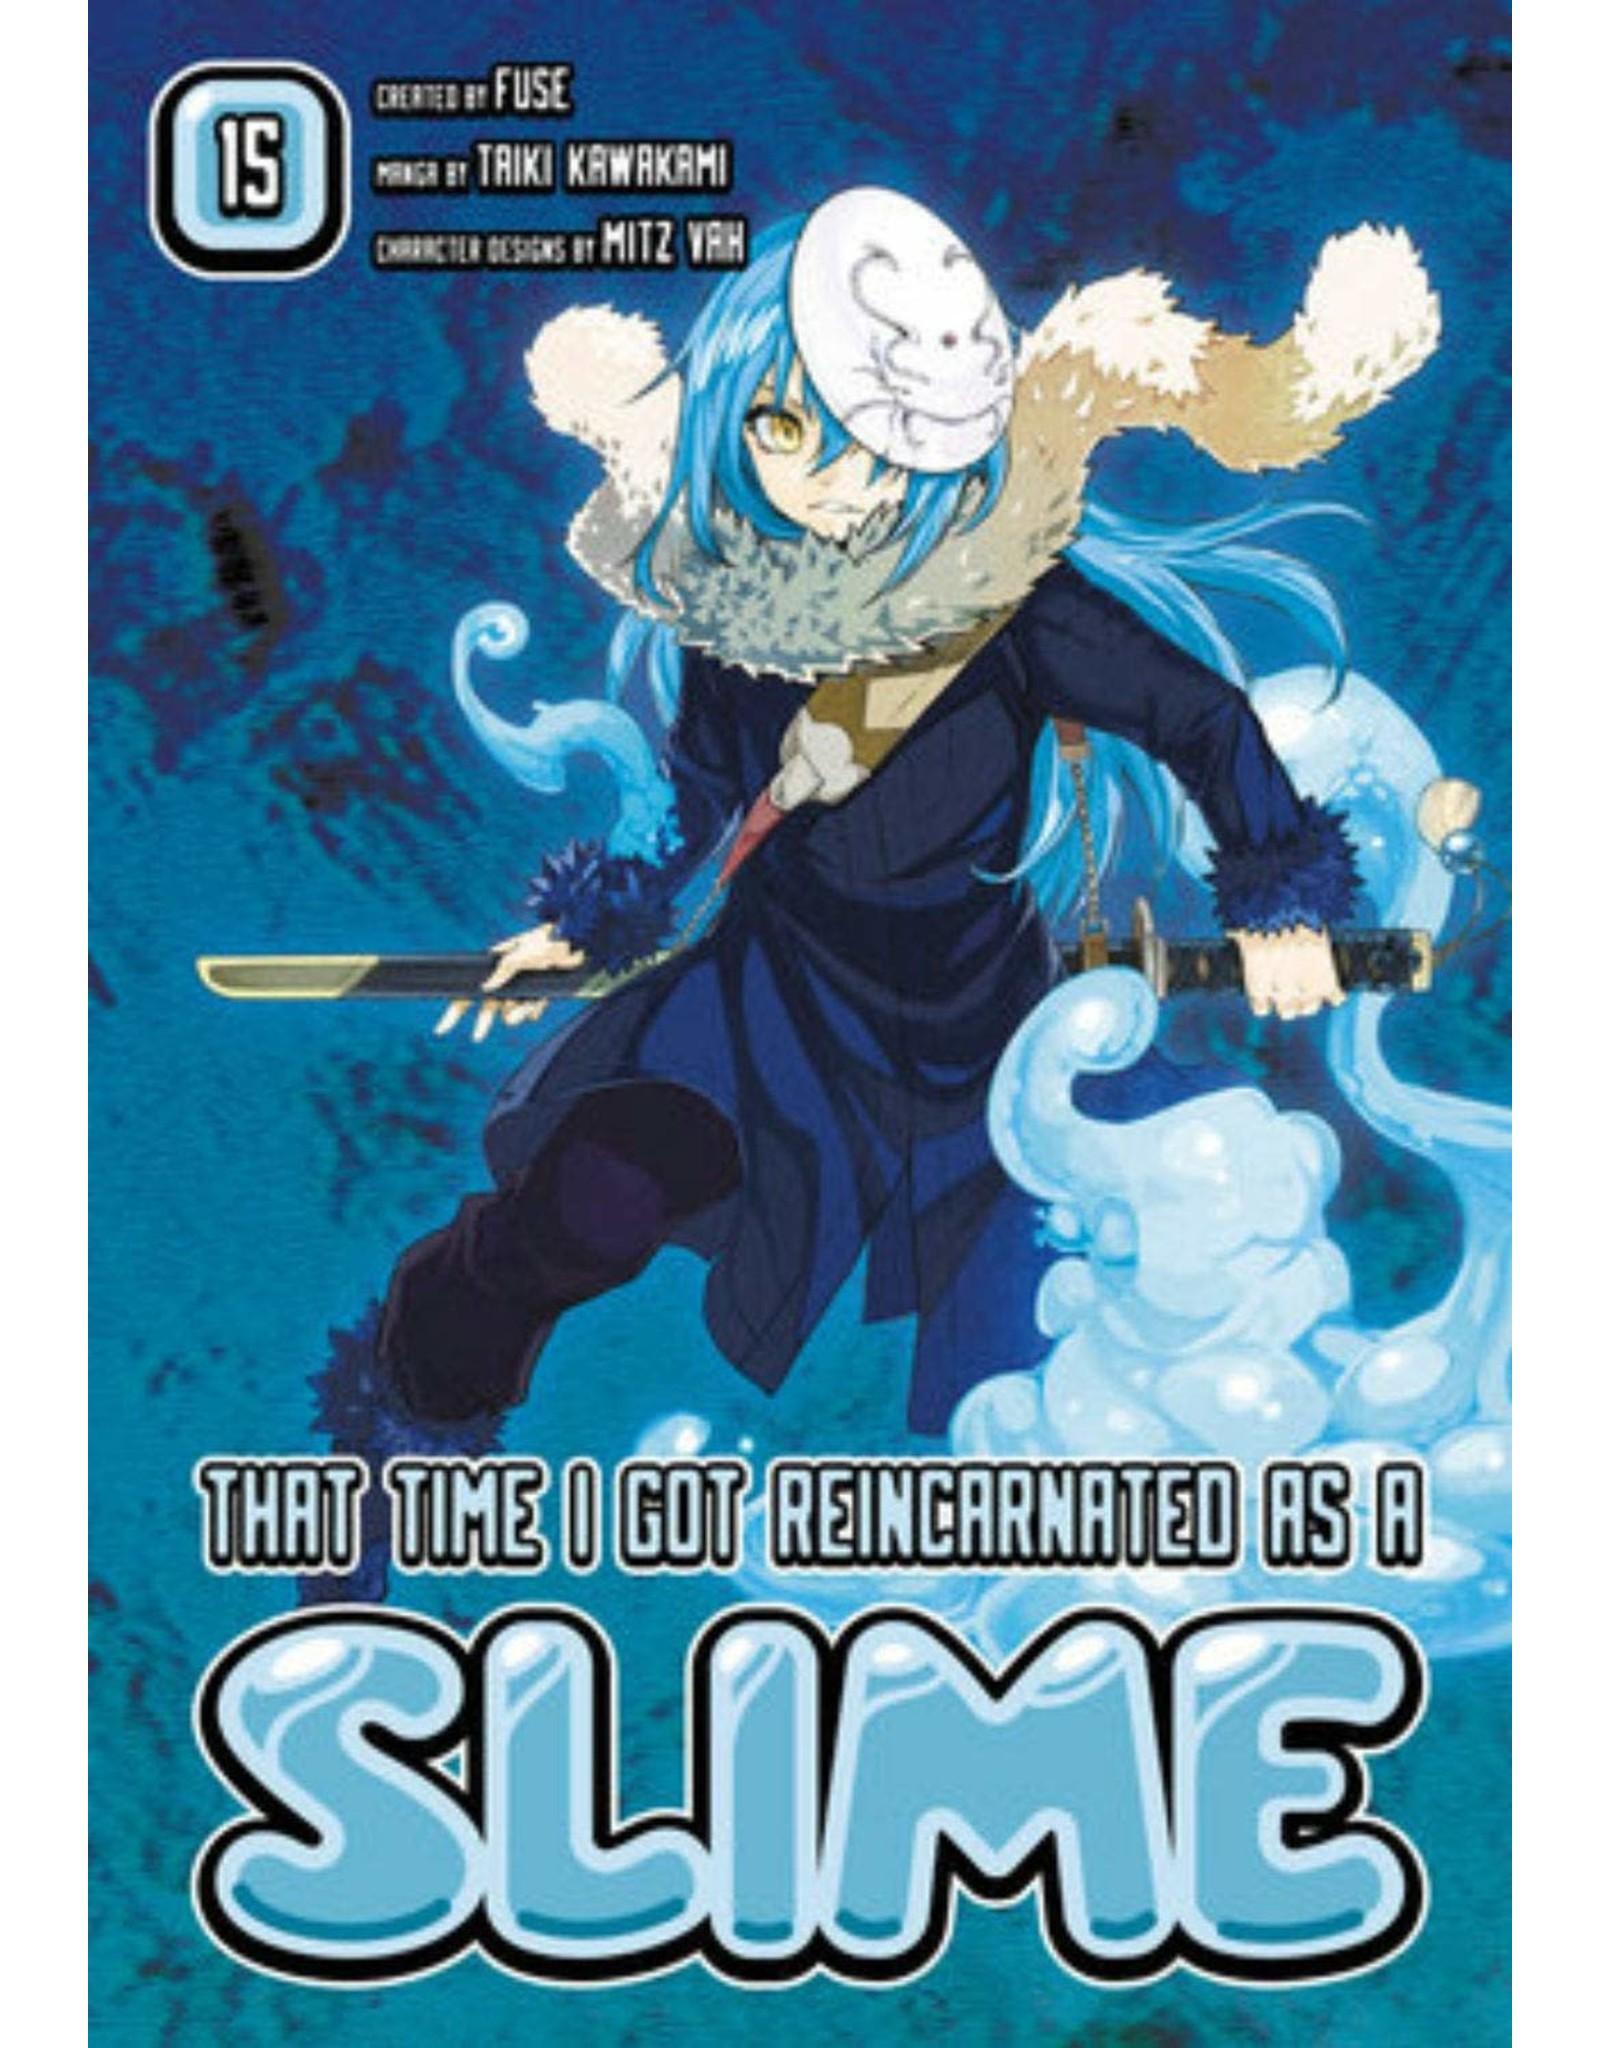 That Time I Got Reincarnated As A Slime 15 (Engelstalig)